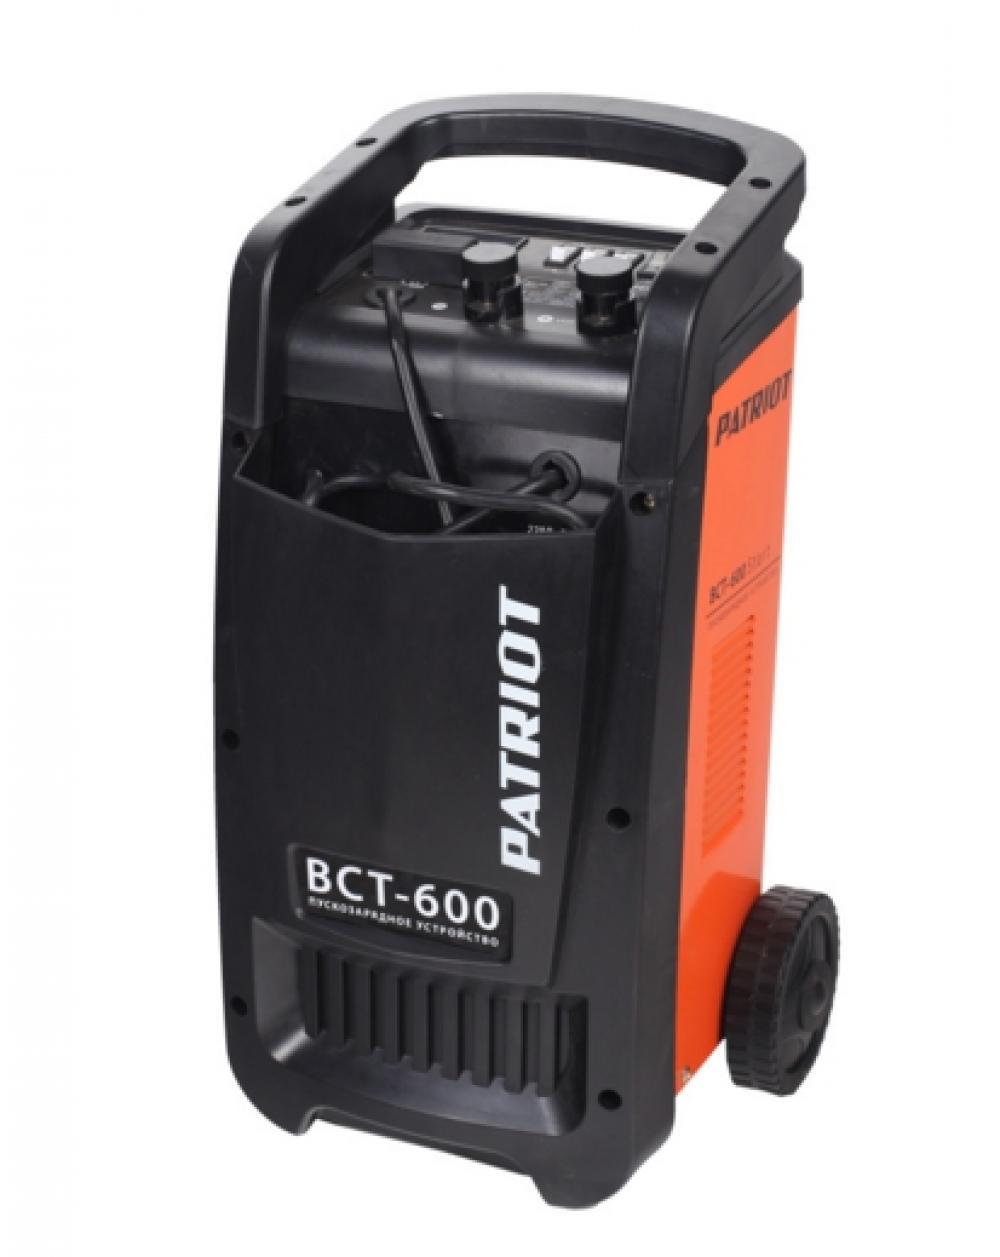 Пускозарядное устройство PATRIOT BCT- 600 Start  пускозарядное устройство patriot bct 30 start